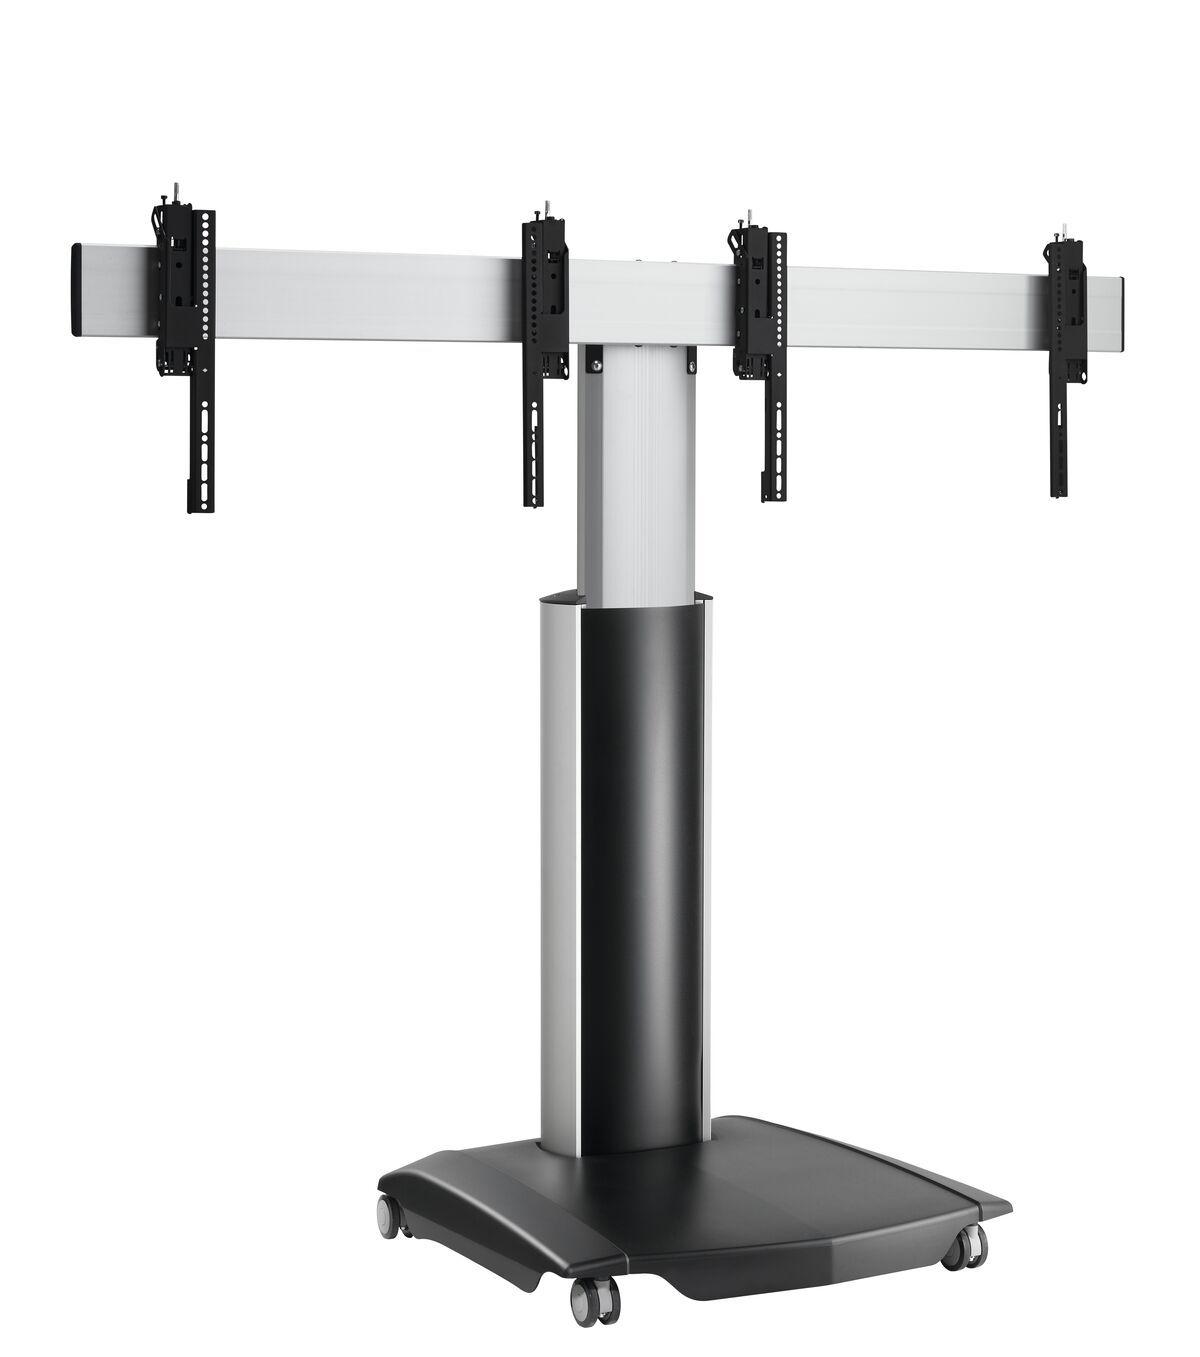 Vogel's PFT 2520 Тележка для дисплея - Detail